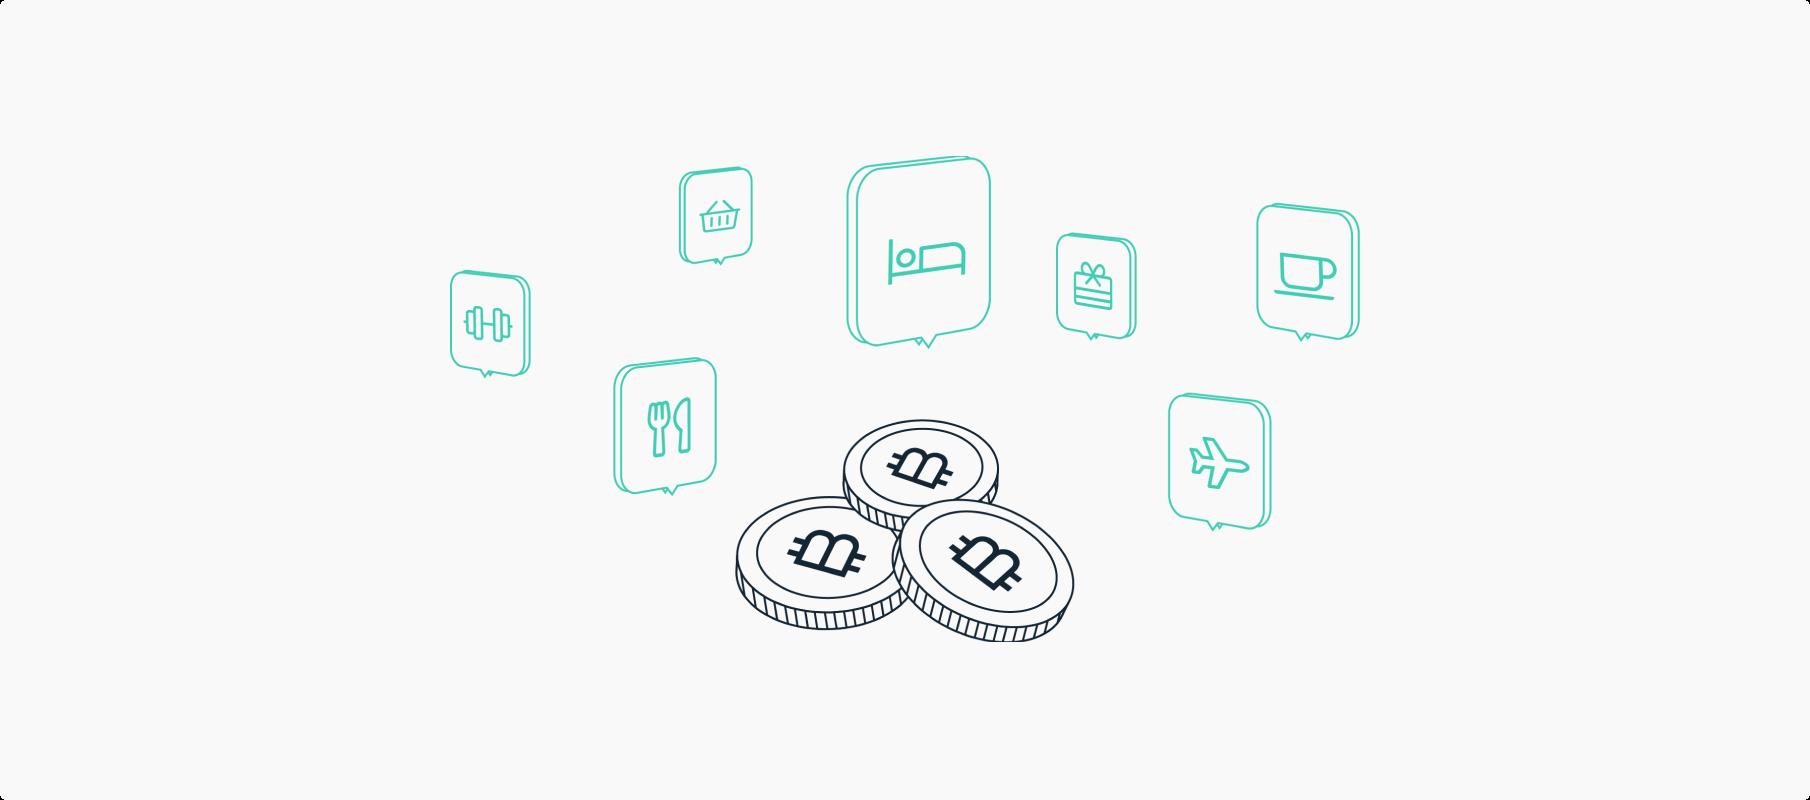 spending cryptocurrencies